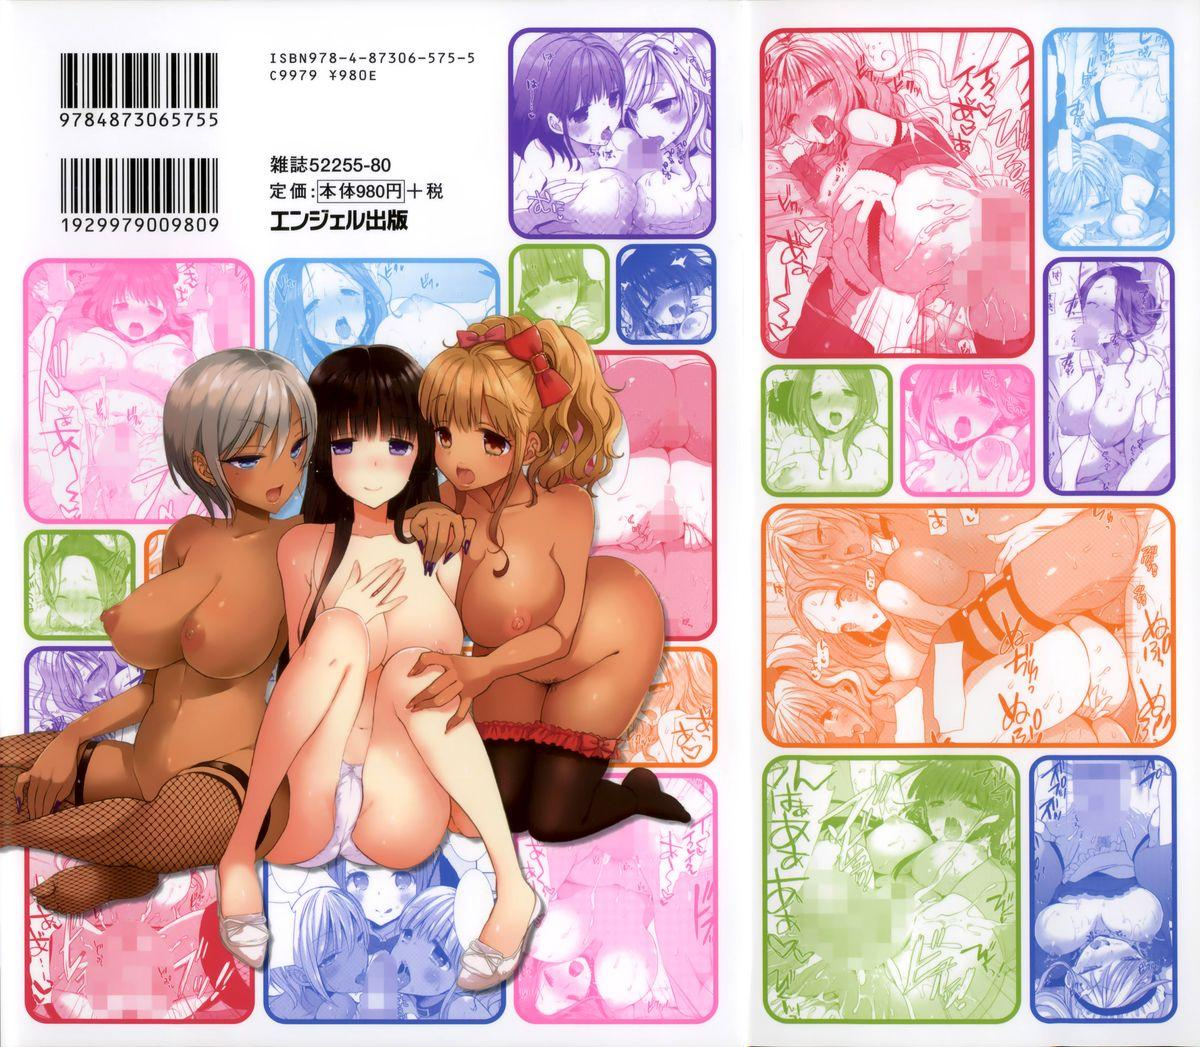 Shiro Kuro Royal Ch. 0-9 & Extra Chapter 204